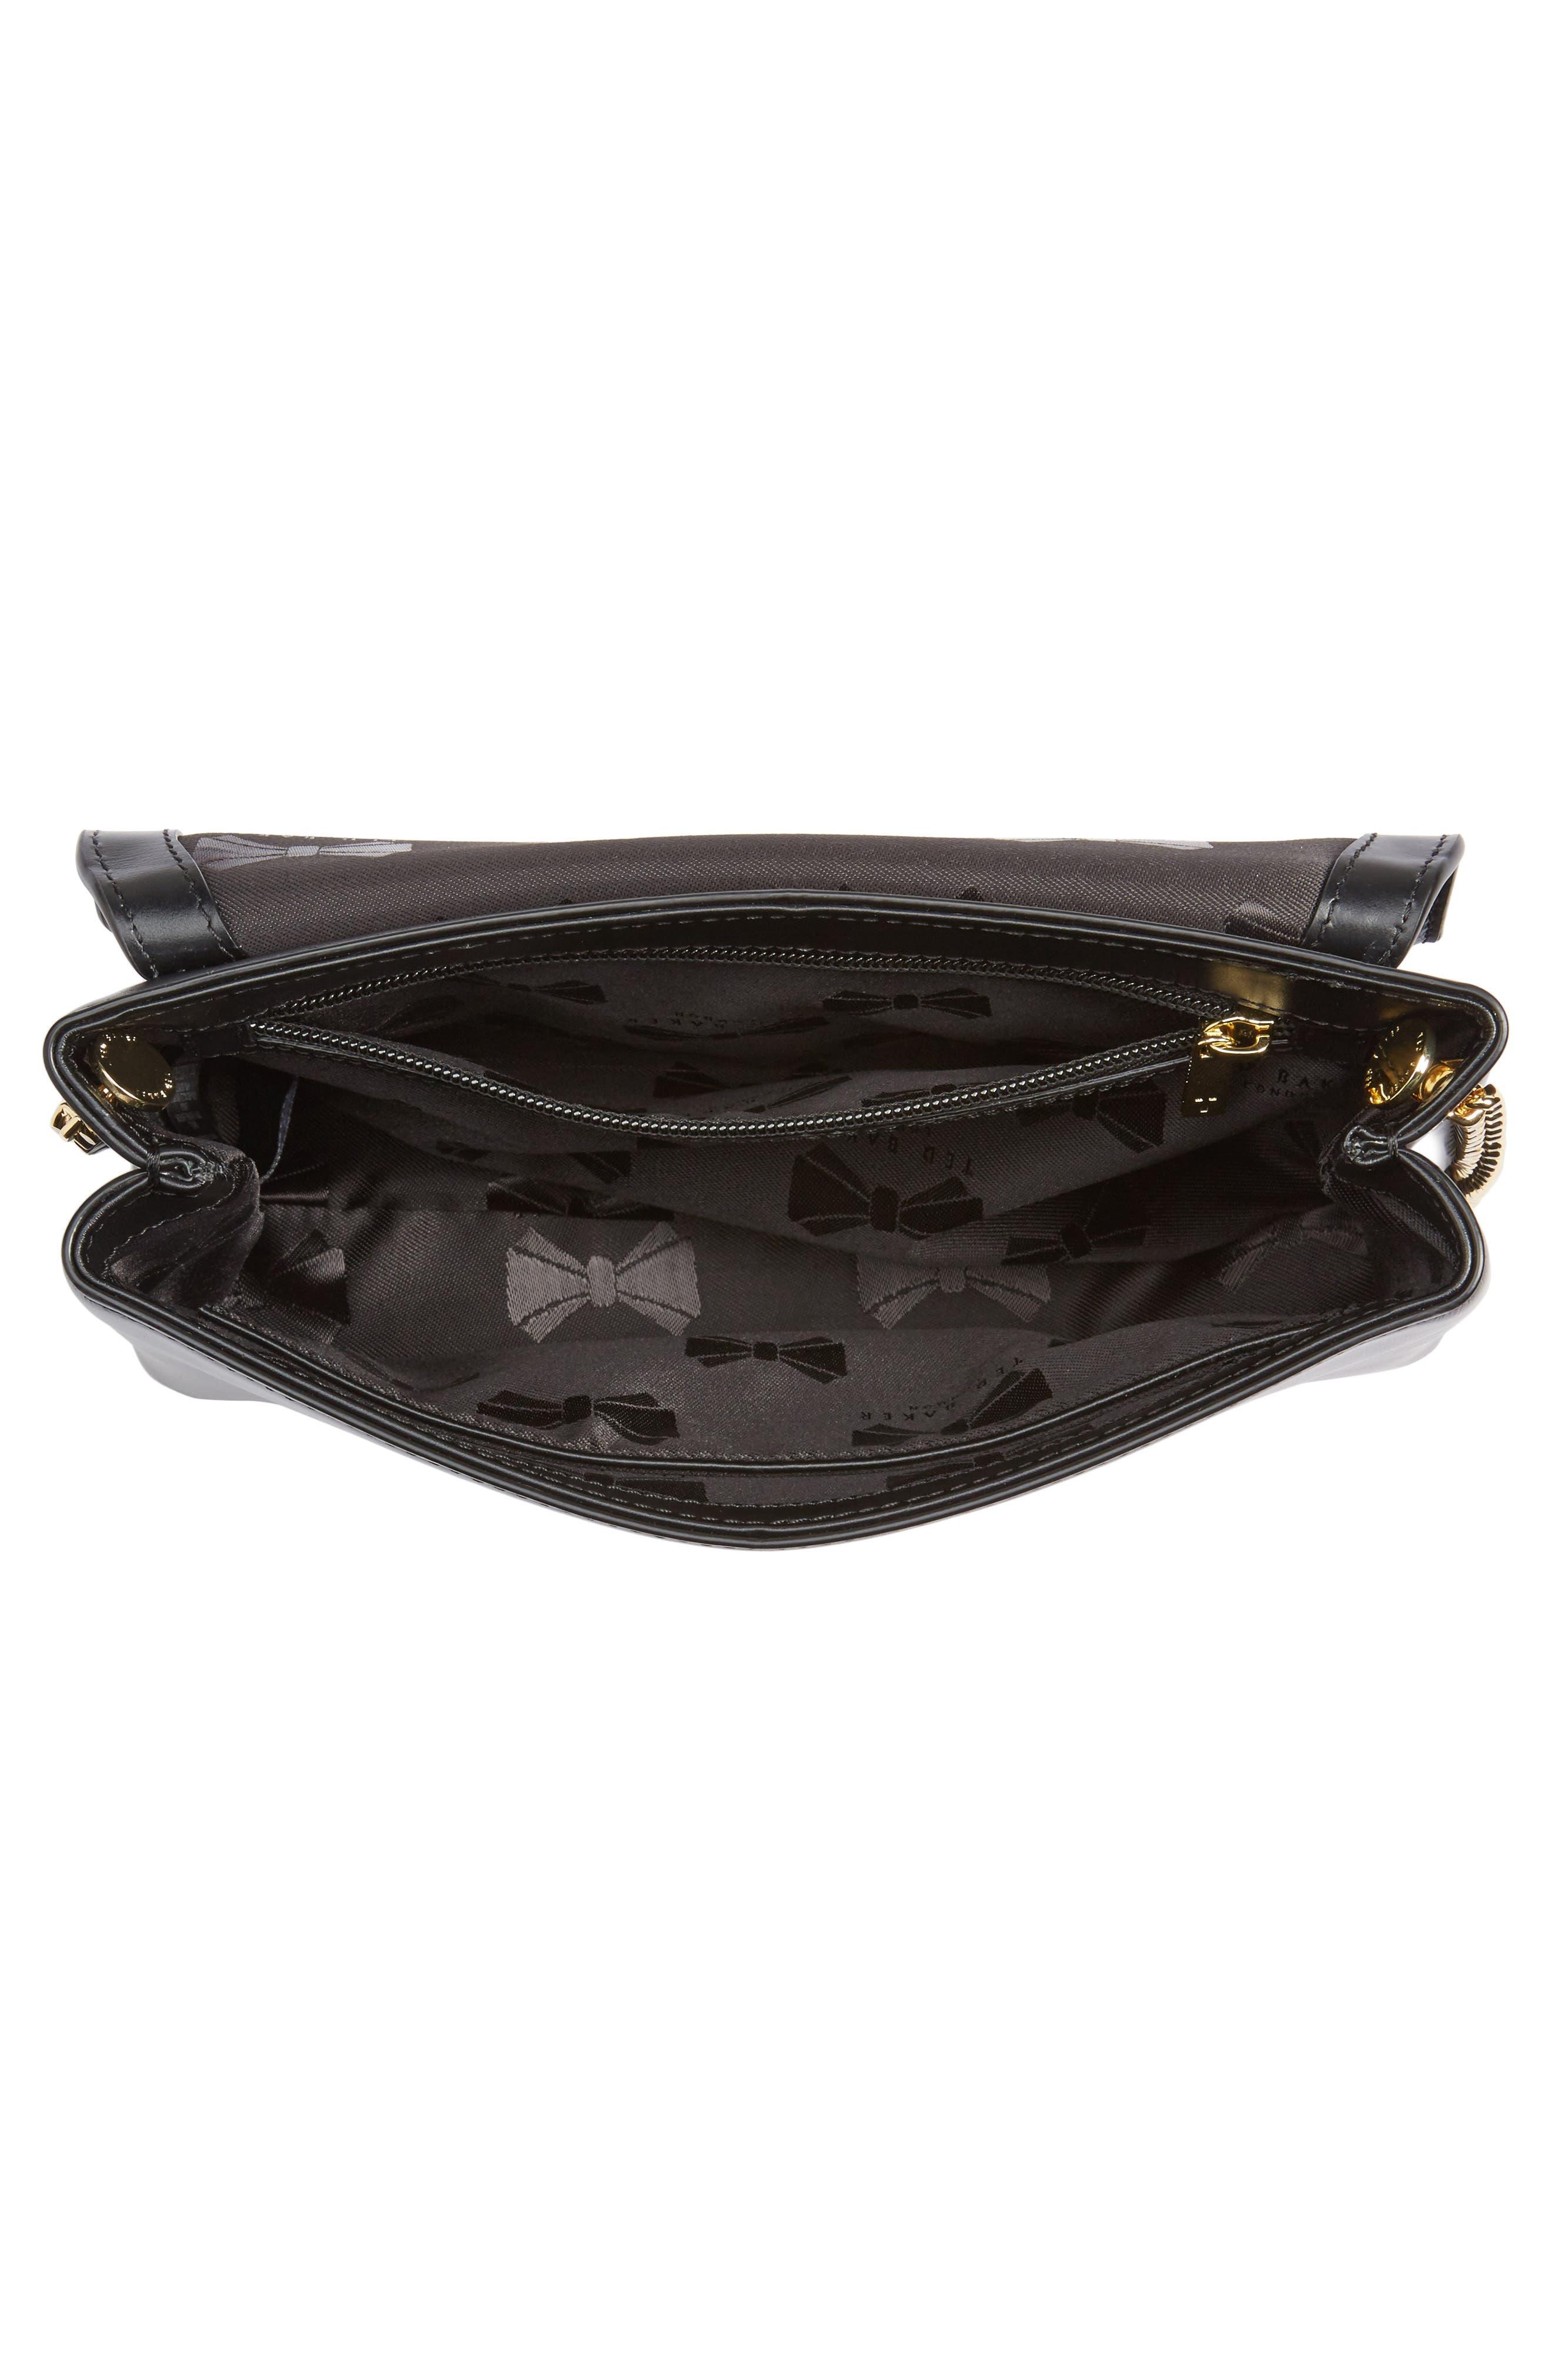 Saraa Leather Crossbody Bag,                             Alternate thumbnail 4, color,                             001